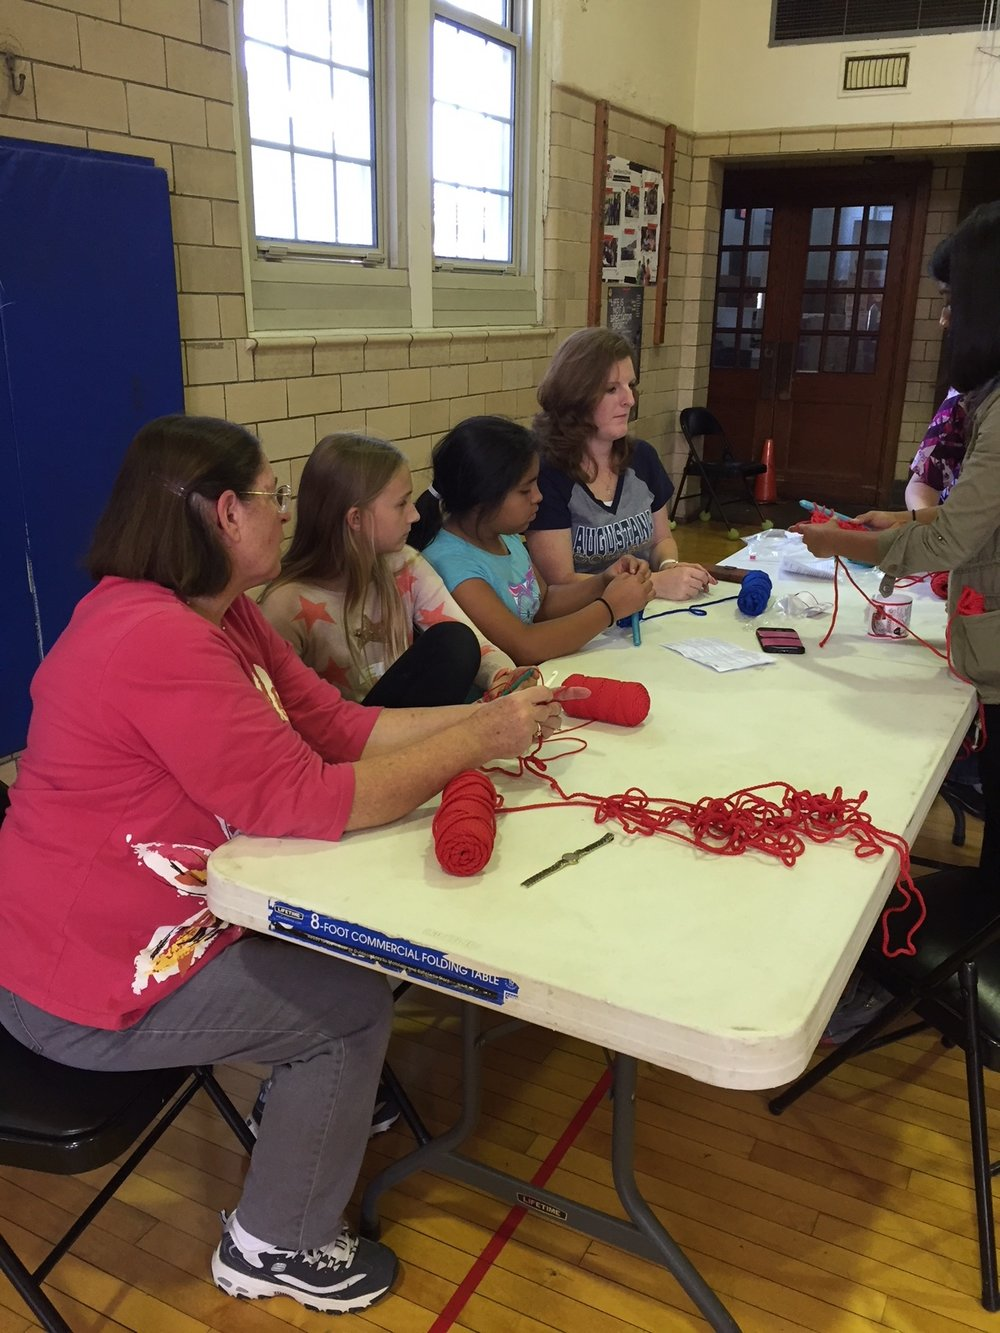 September Crochet-In at Longfellow Liberal Arts Elementary School (photo courtesy of Berni Carmak)